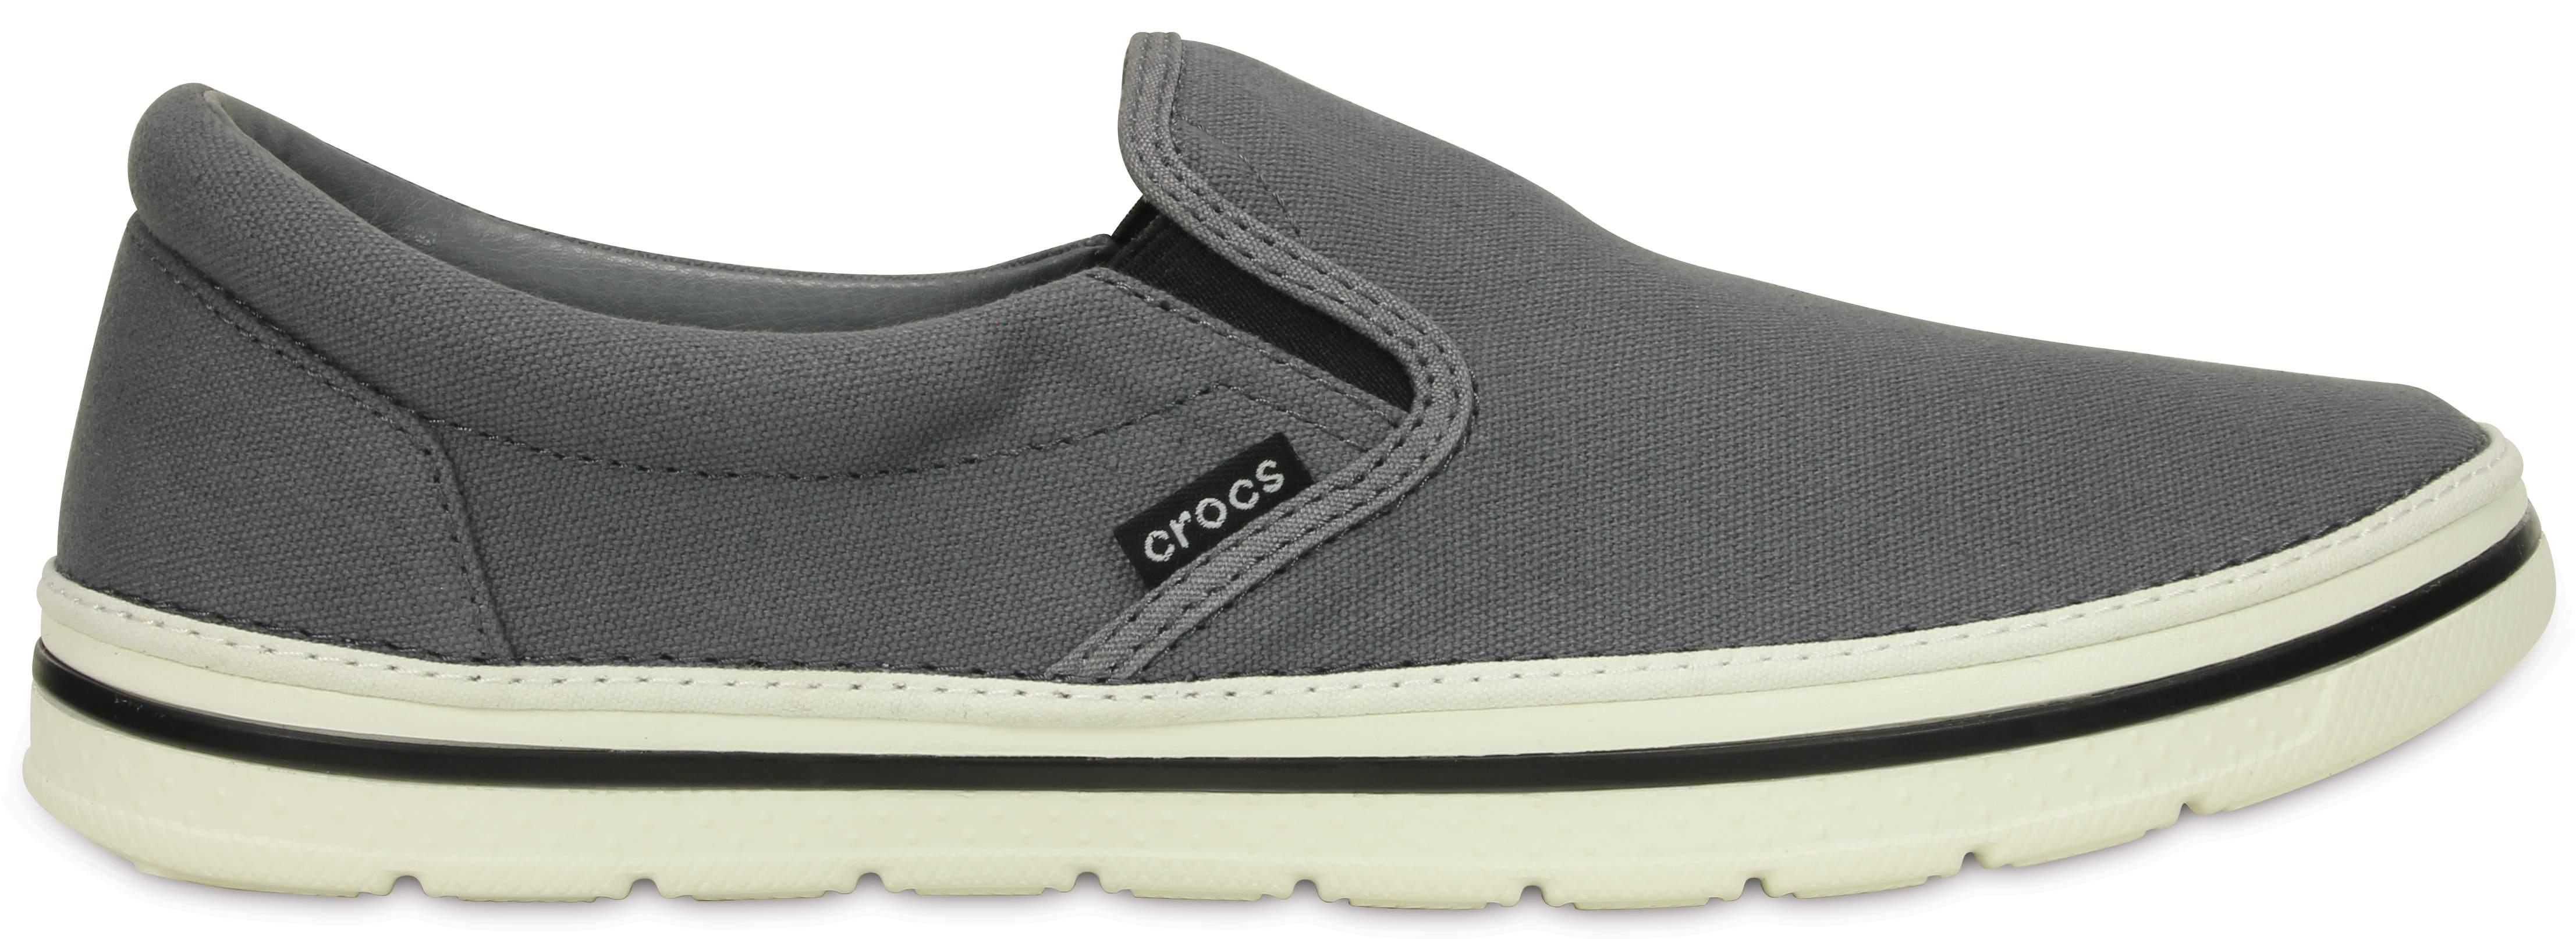 Men's Crocs Norlin Slip-on